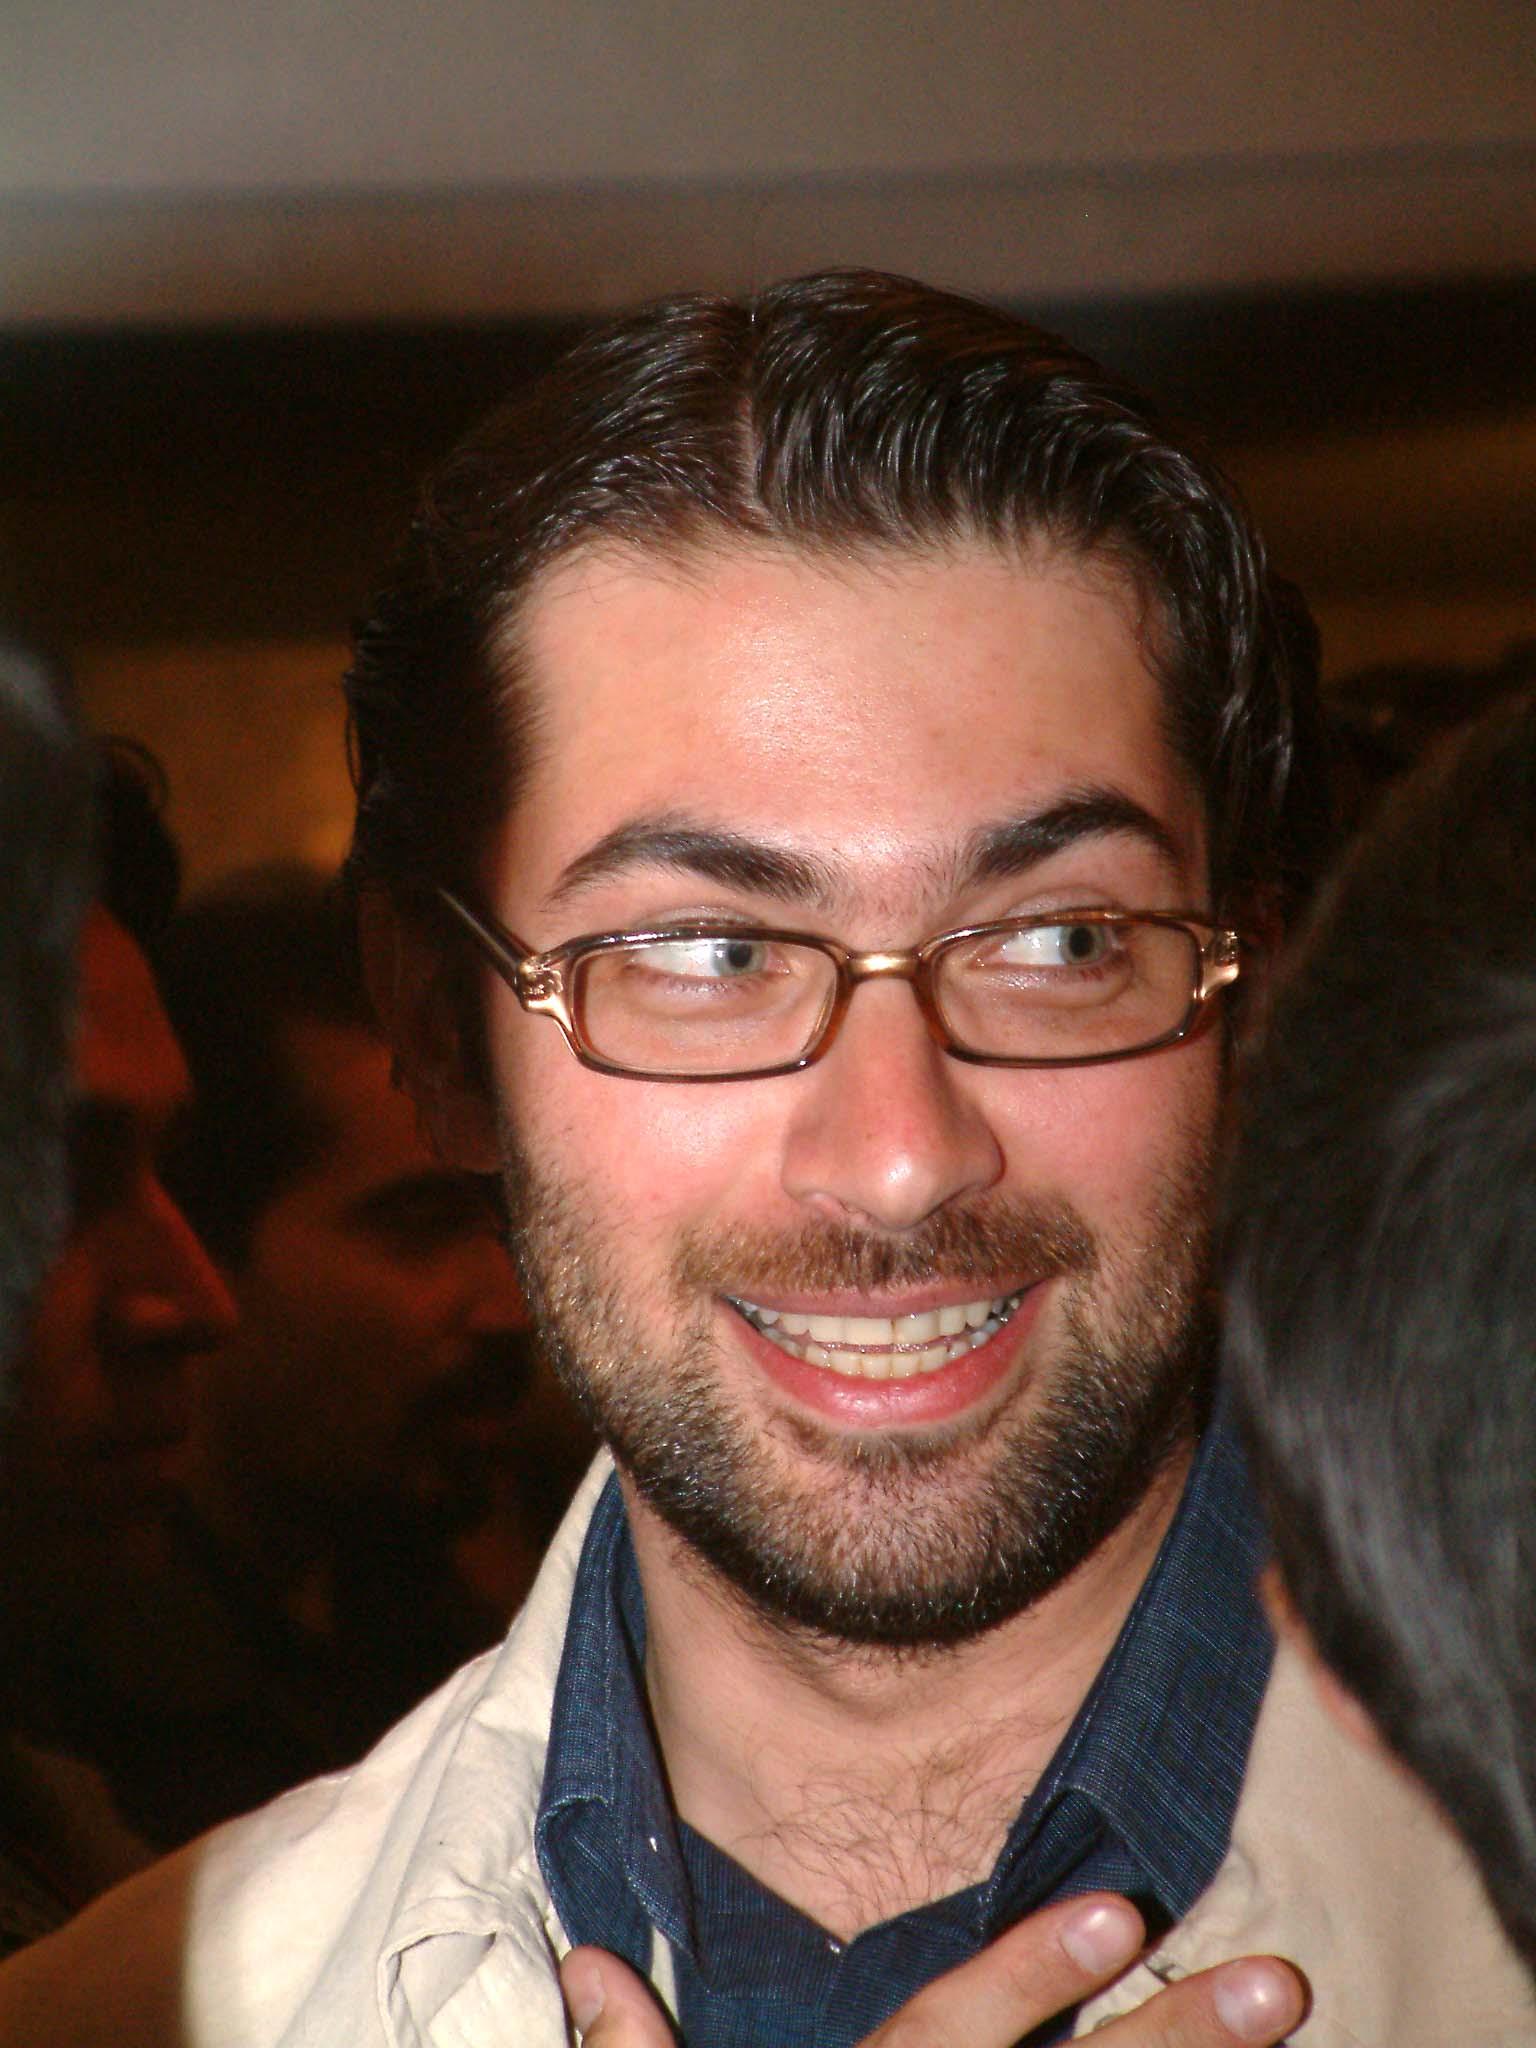 http://cinemapars.persiangig.com/Persian%20Actor/09%20Parsa%20Piroozfar/Parsa_Piroozfar02.JPG